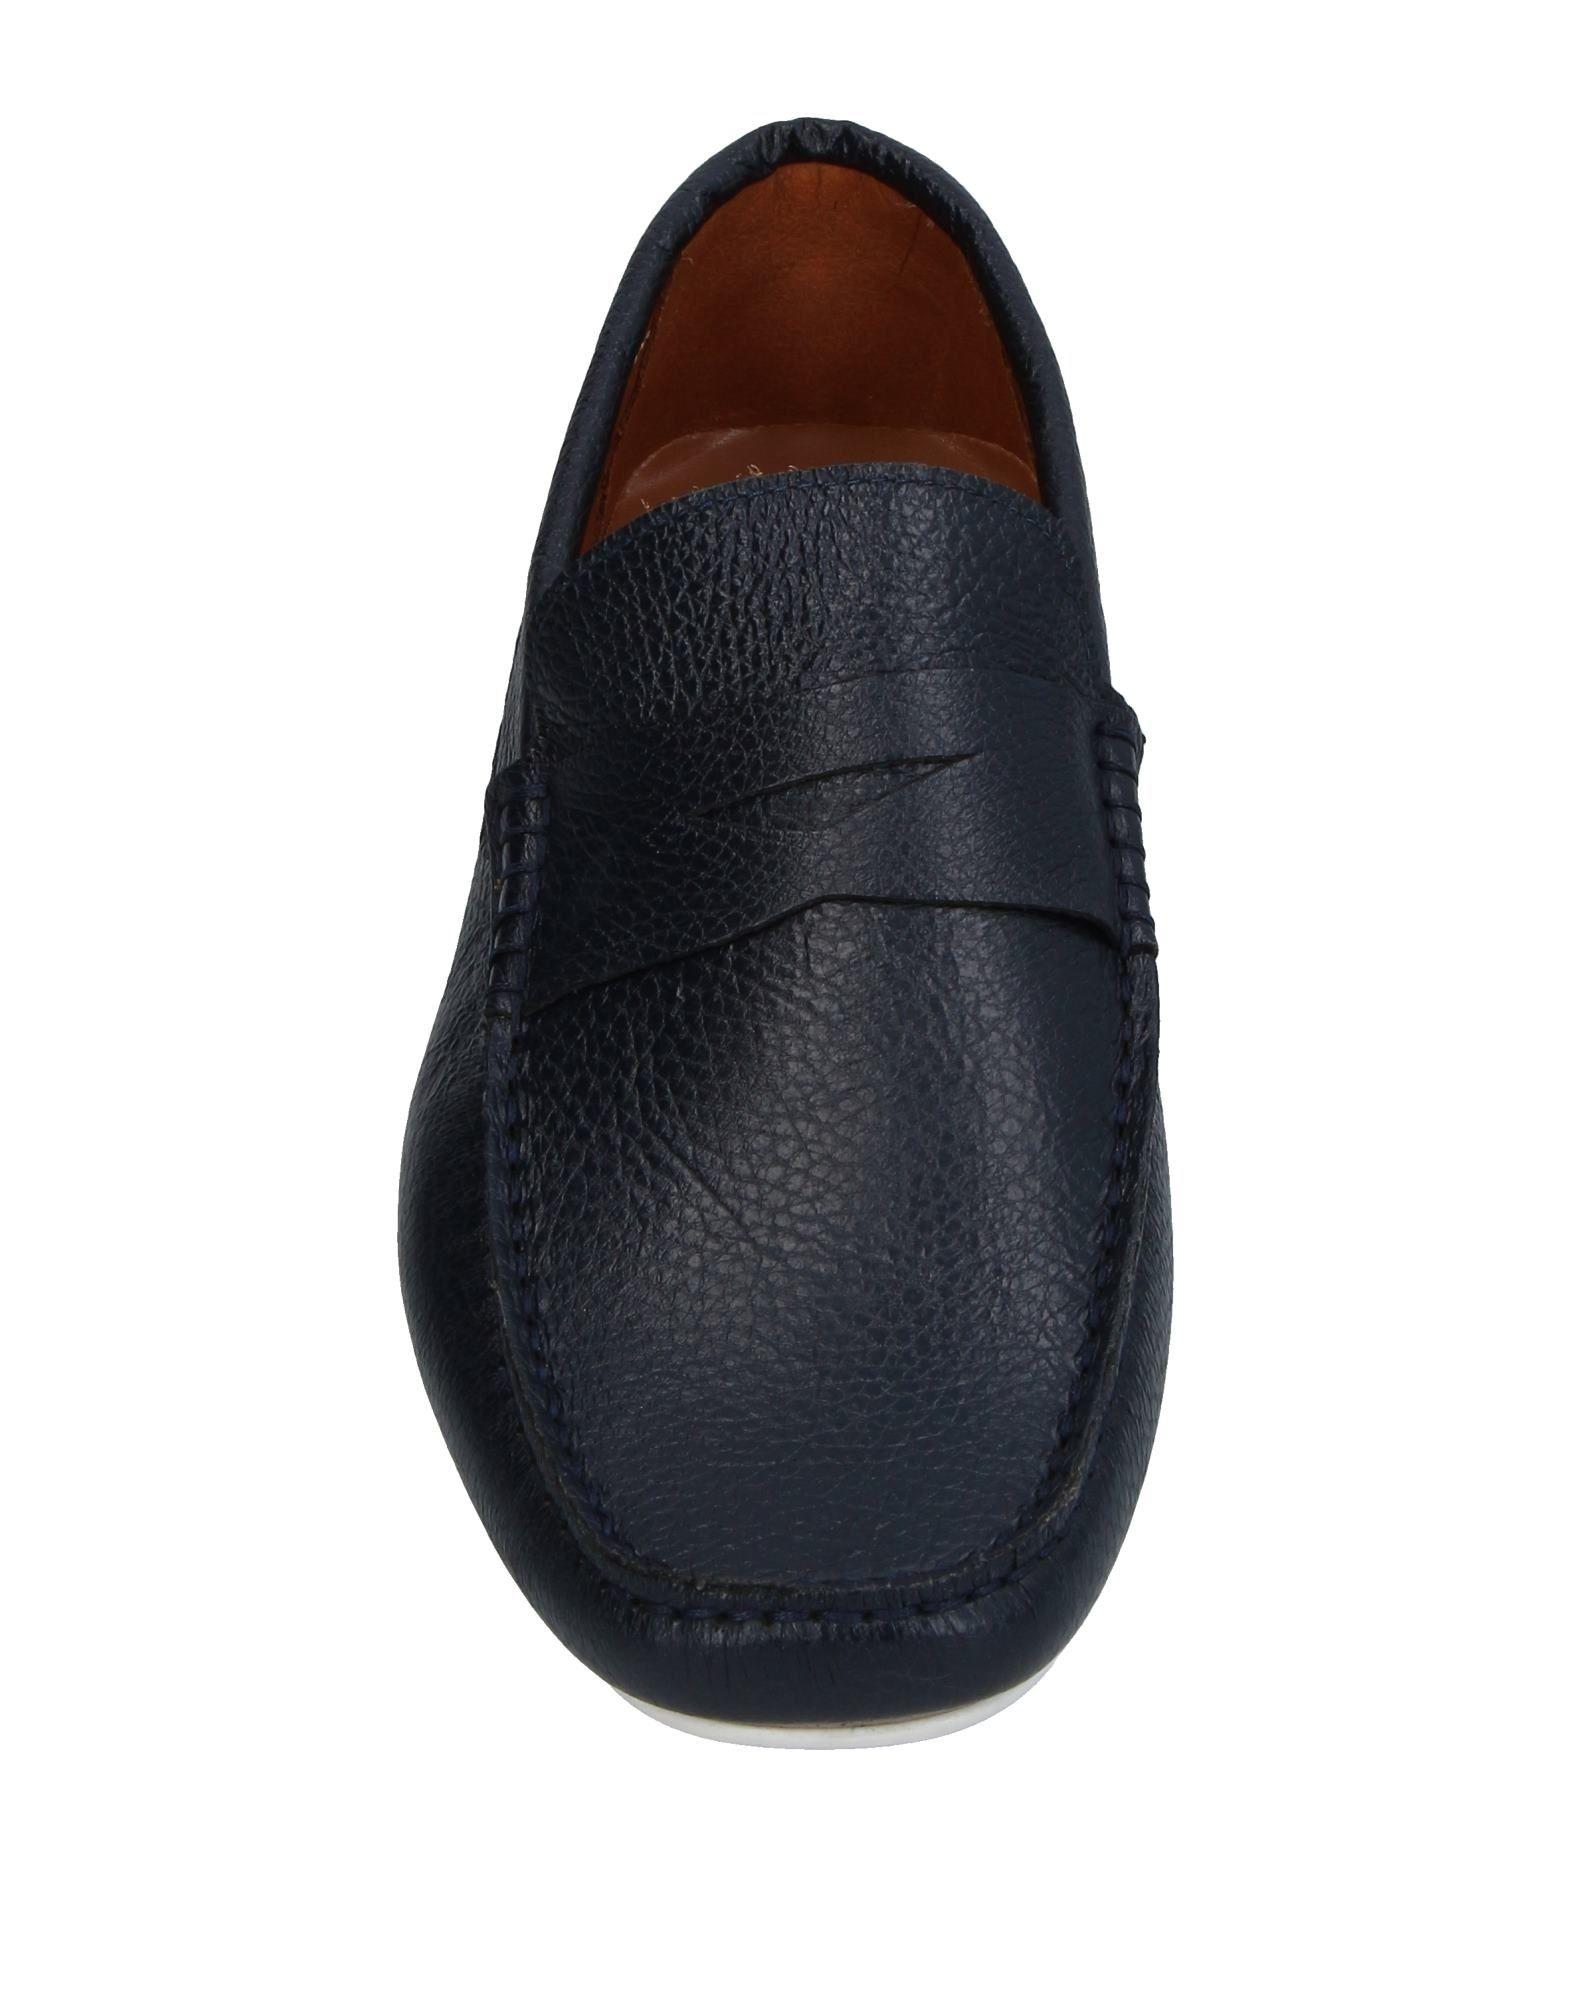 Cantarelli Mokassins Herren Heiße  11374973AS Heiße Herren Schuhe 7087bc